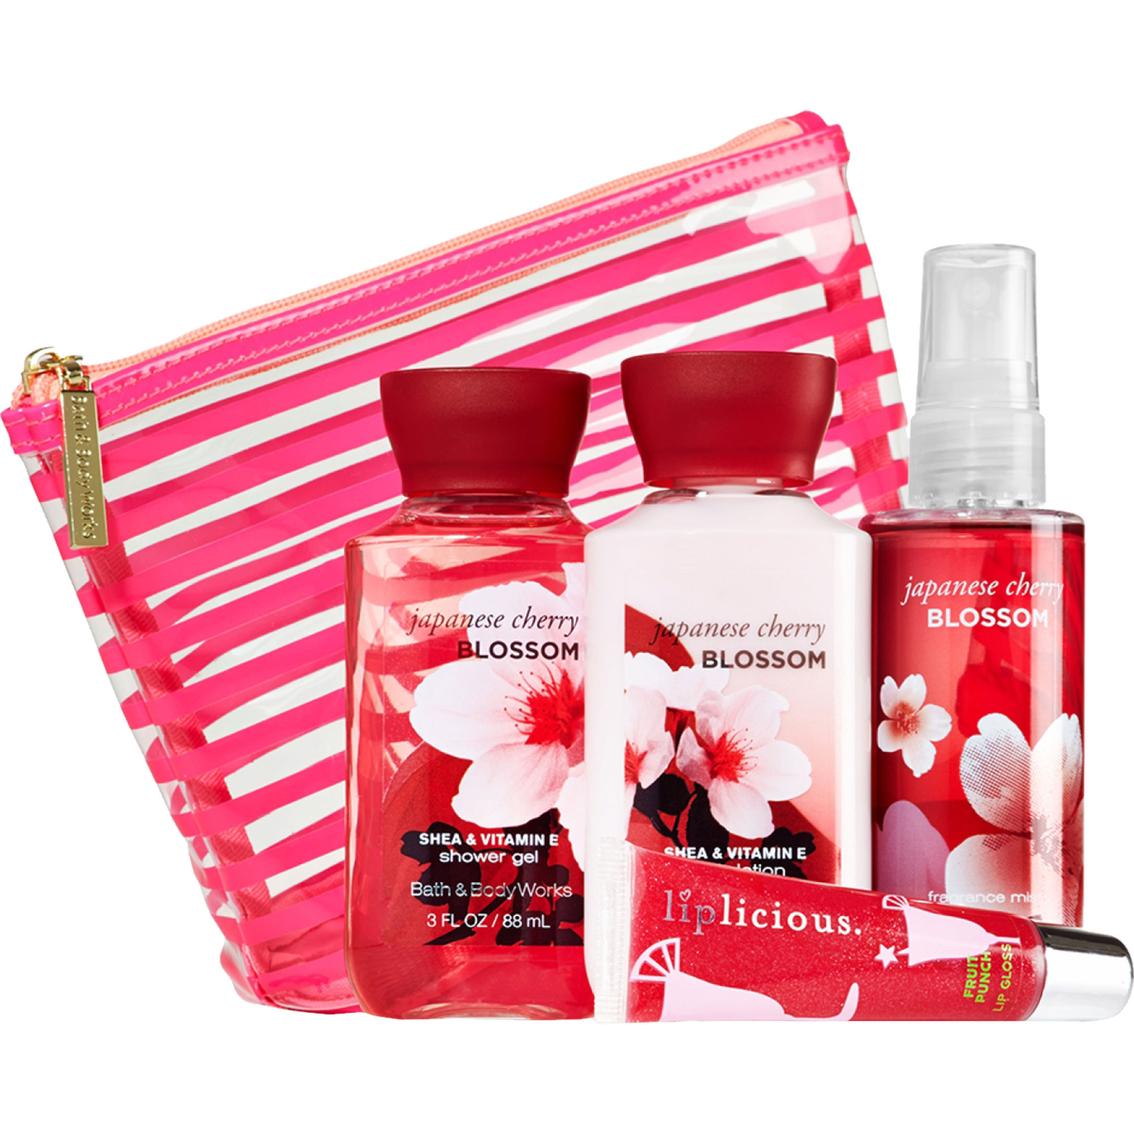 Bath and body works japanese cherry blossom mini ritual